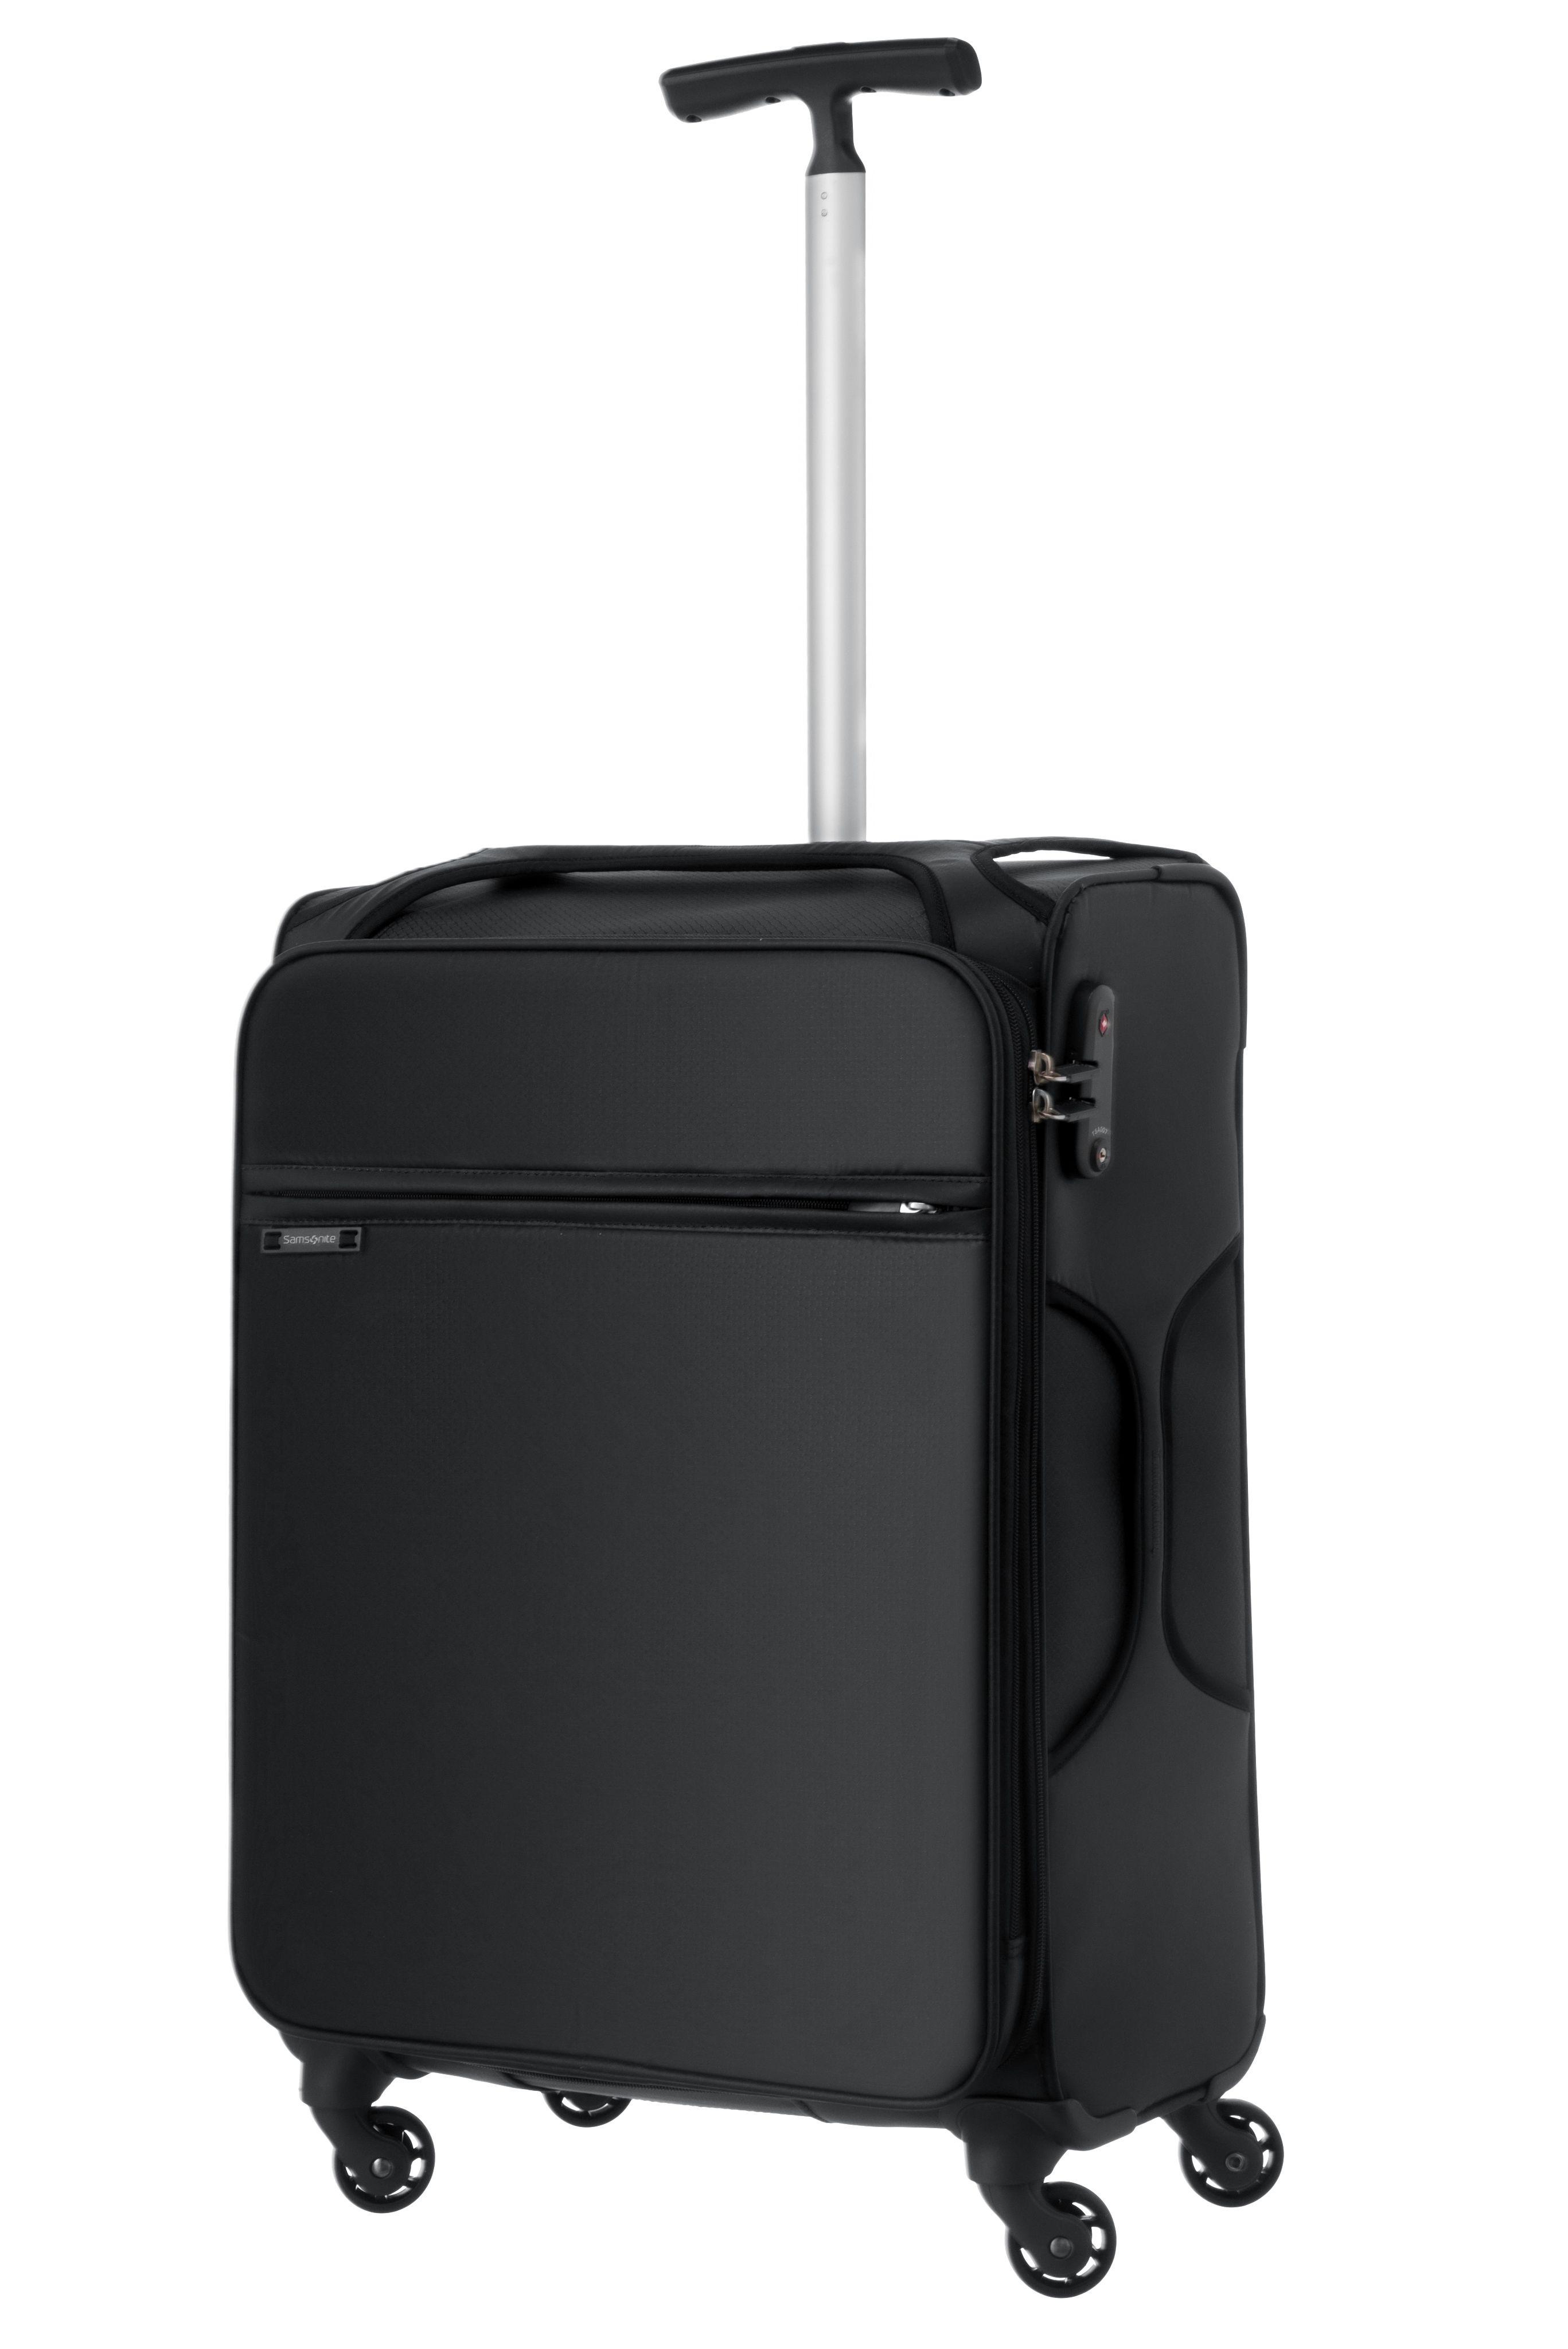 Monotrax Black 65cm Spinner #Samsonite #Monotrax #Travel #Suitcase ...